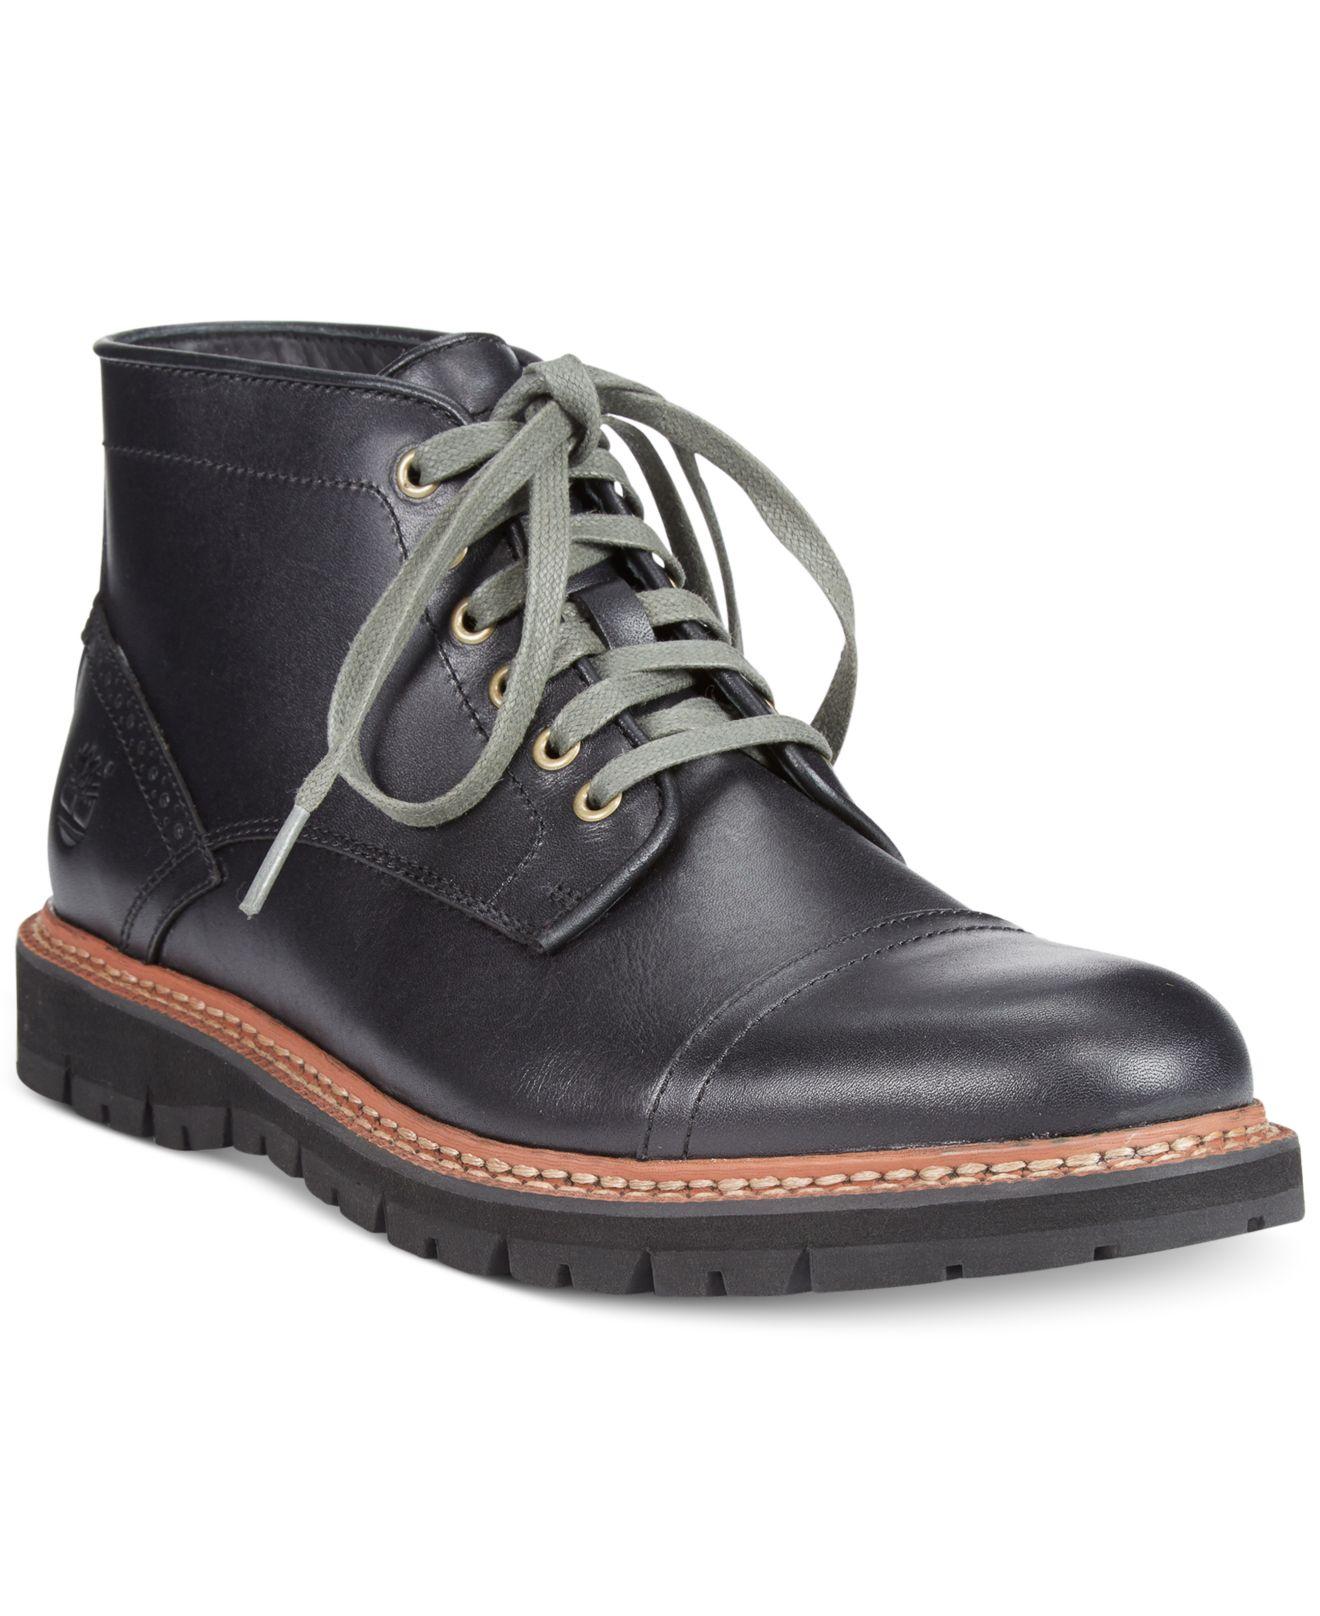 Clarks Shoes Briton